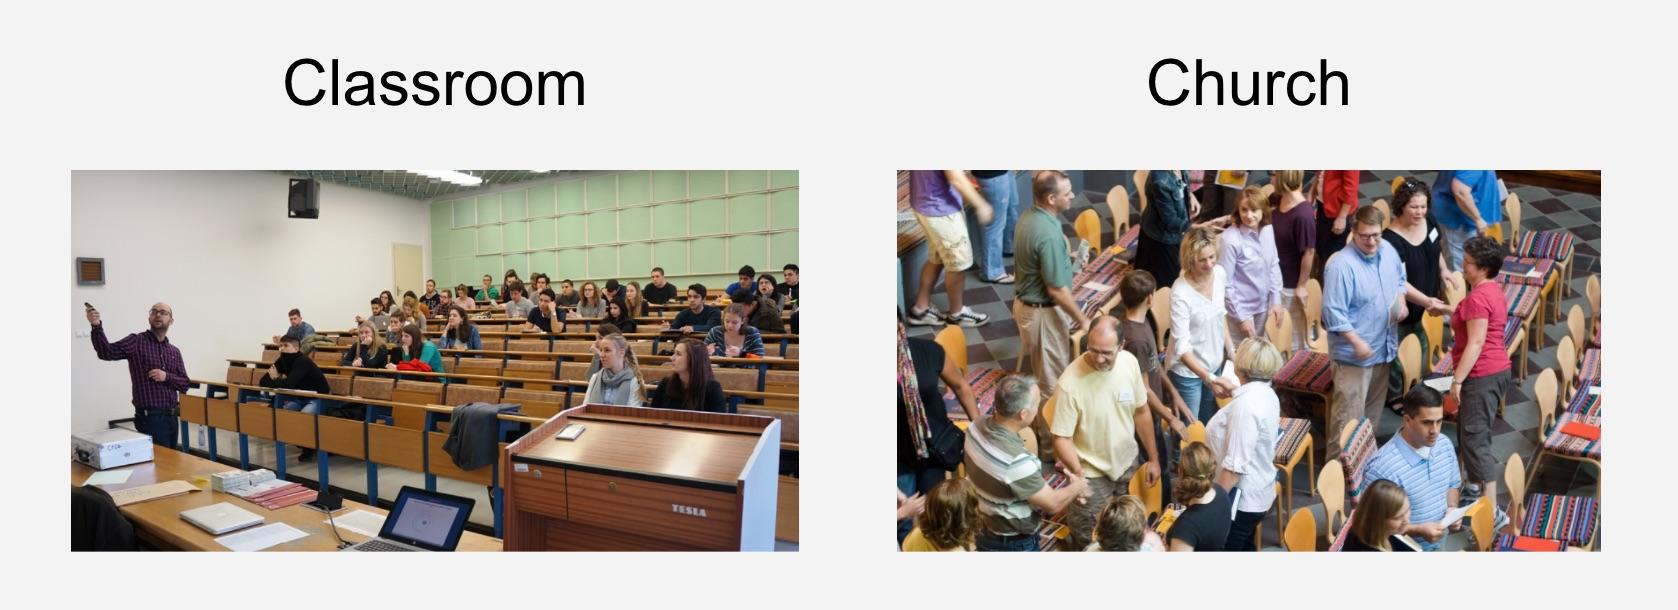 classroom_vs_church